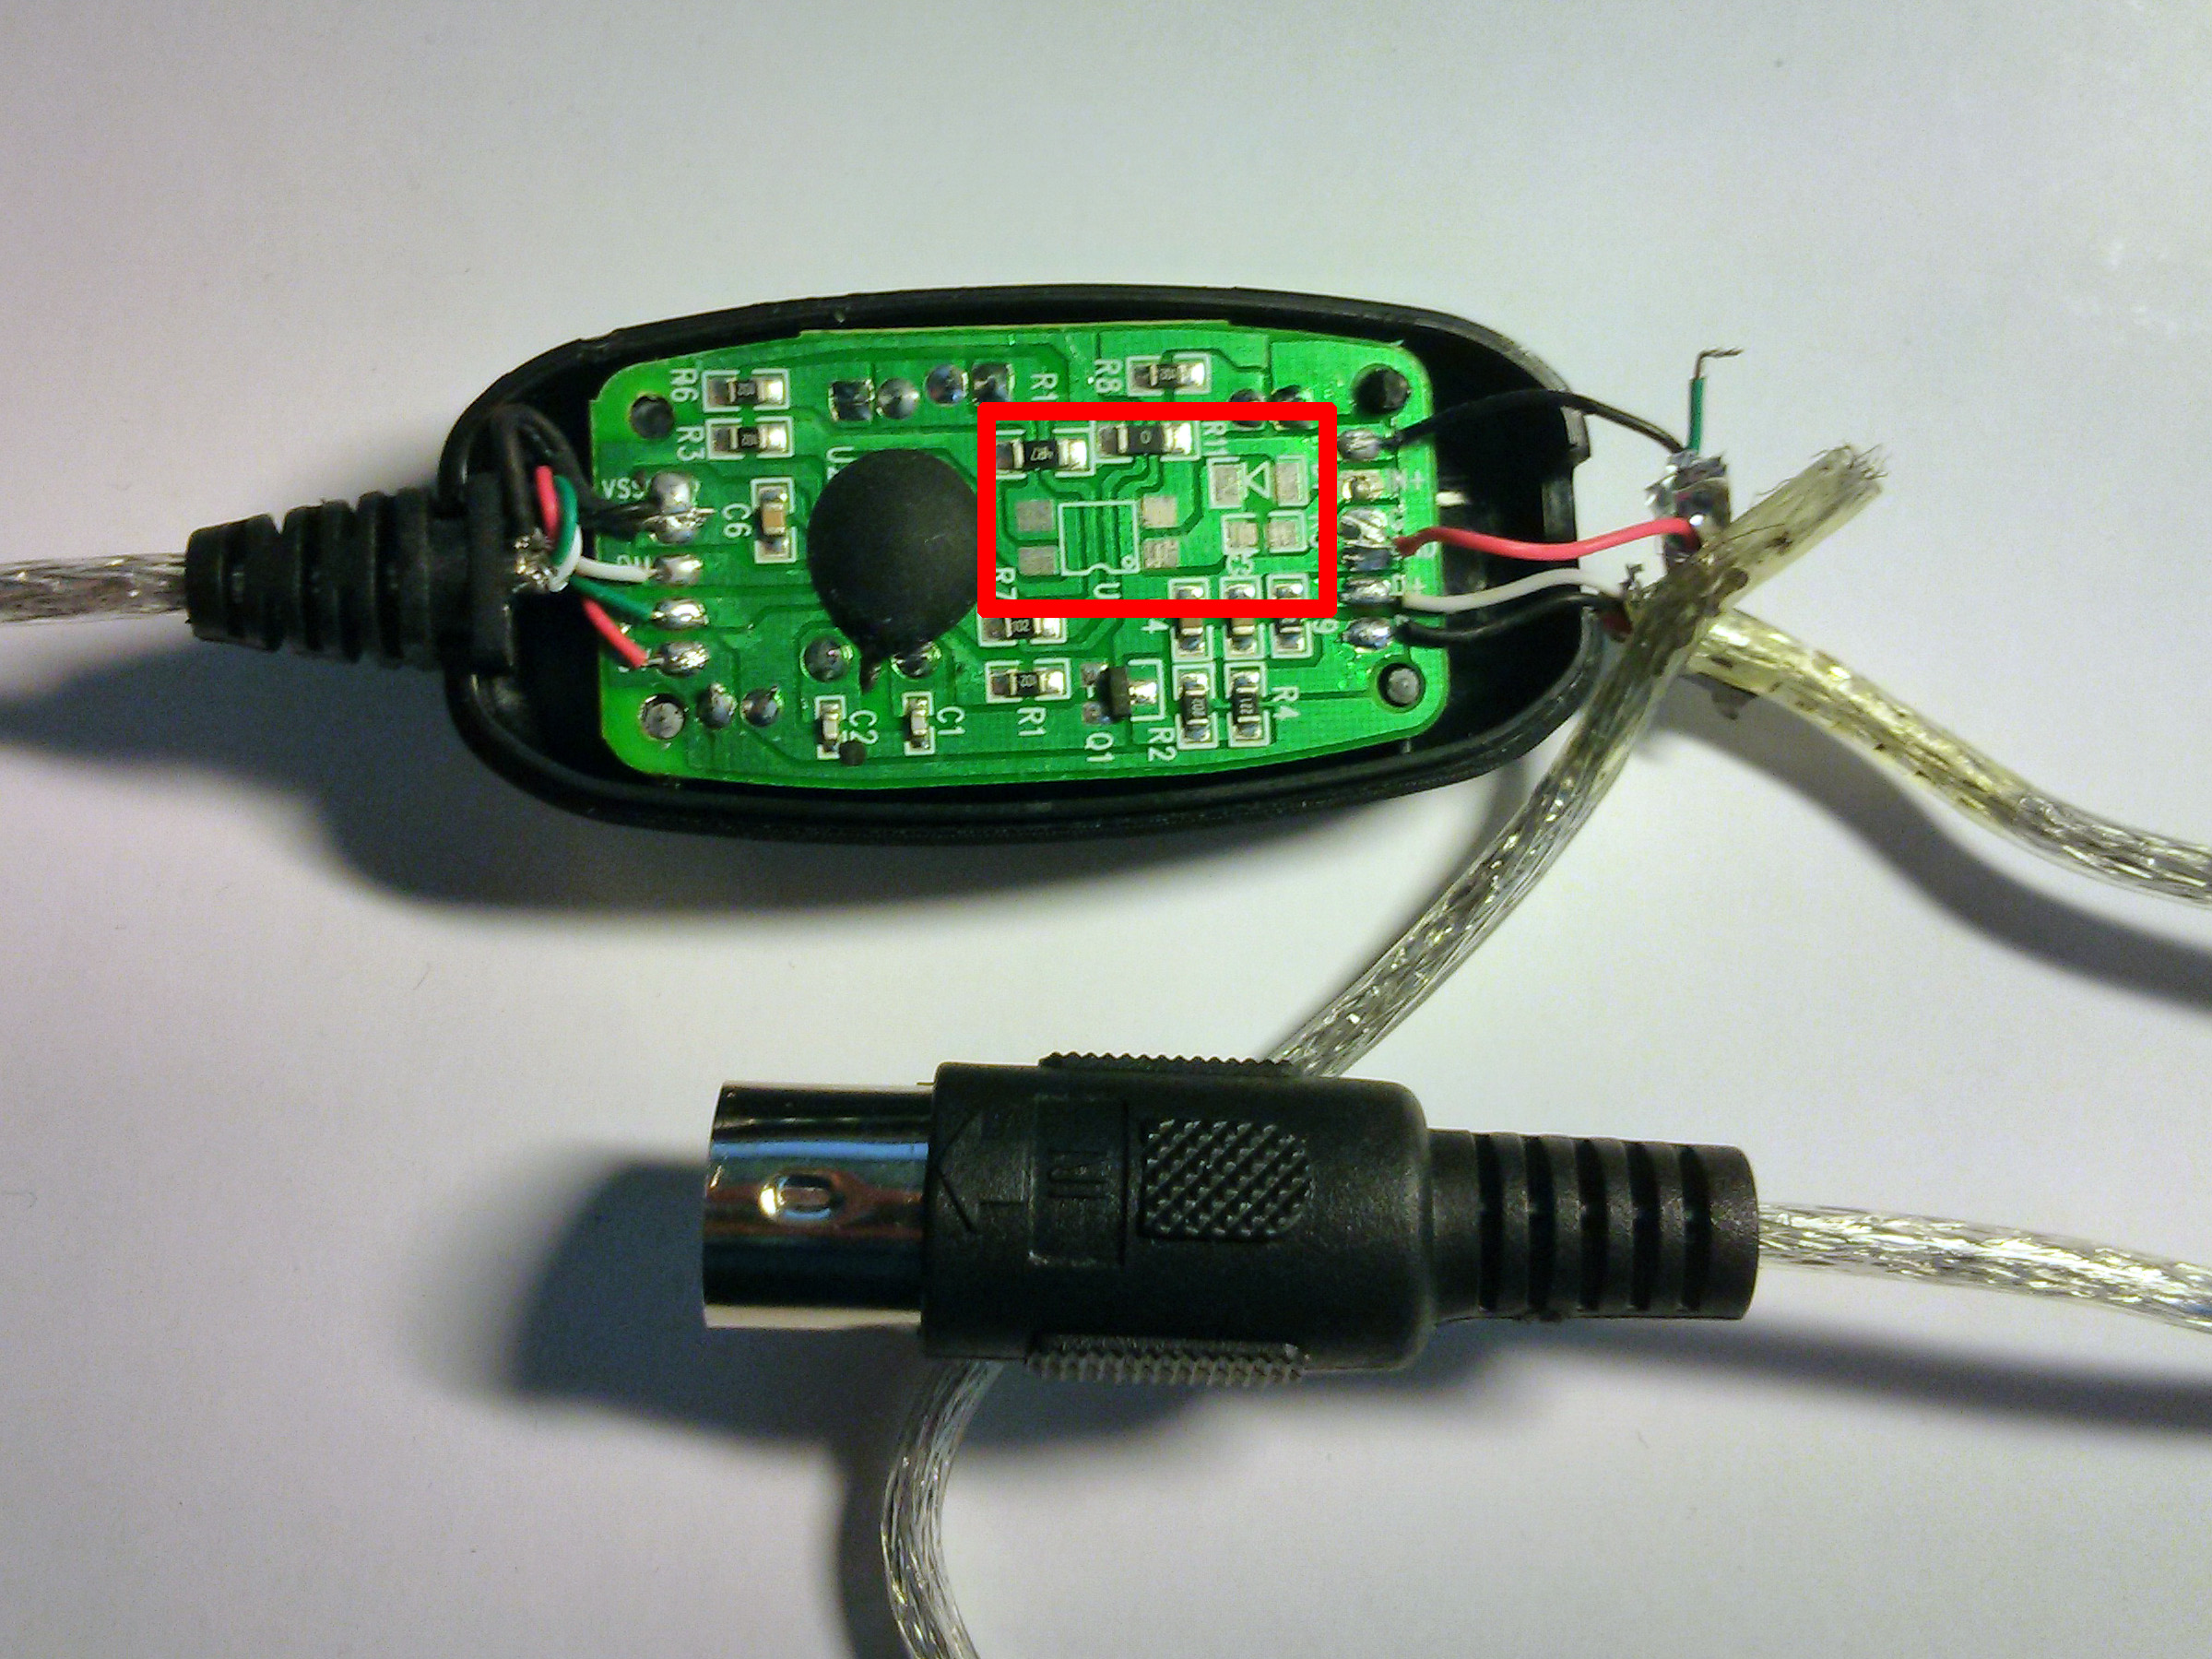 WC_0608] Midi To Usb Cable Wiring Diagram Schematic WiringAnal Phon Alma Inama Redne Ally Groa Boapu Mohammedshrine Librar Wiring 101